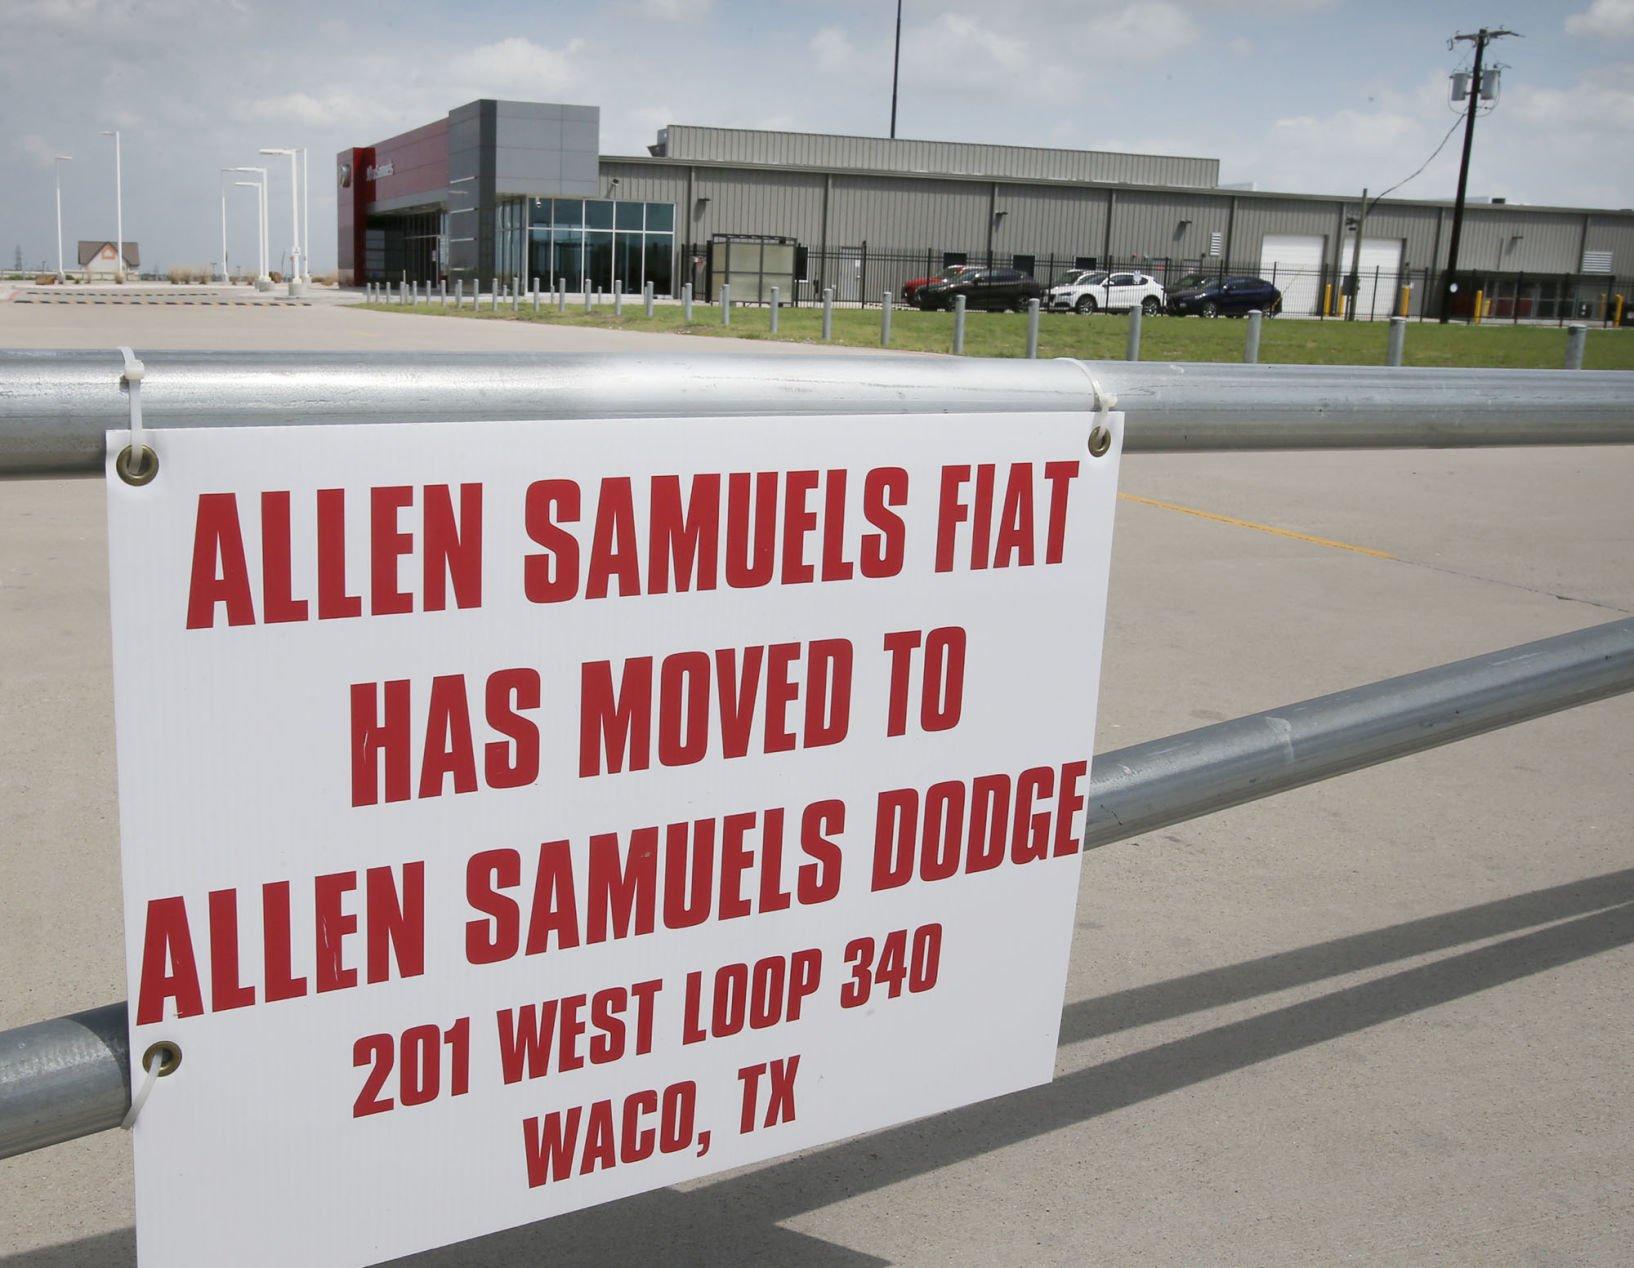 Dodge Dealership Waco Tx Luxury Allen Samuel Dodge Waconew And Used Source  · Volkswagen May Move Into Former Alfa Romeo Fiat Dealership